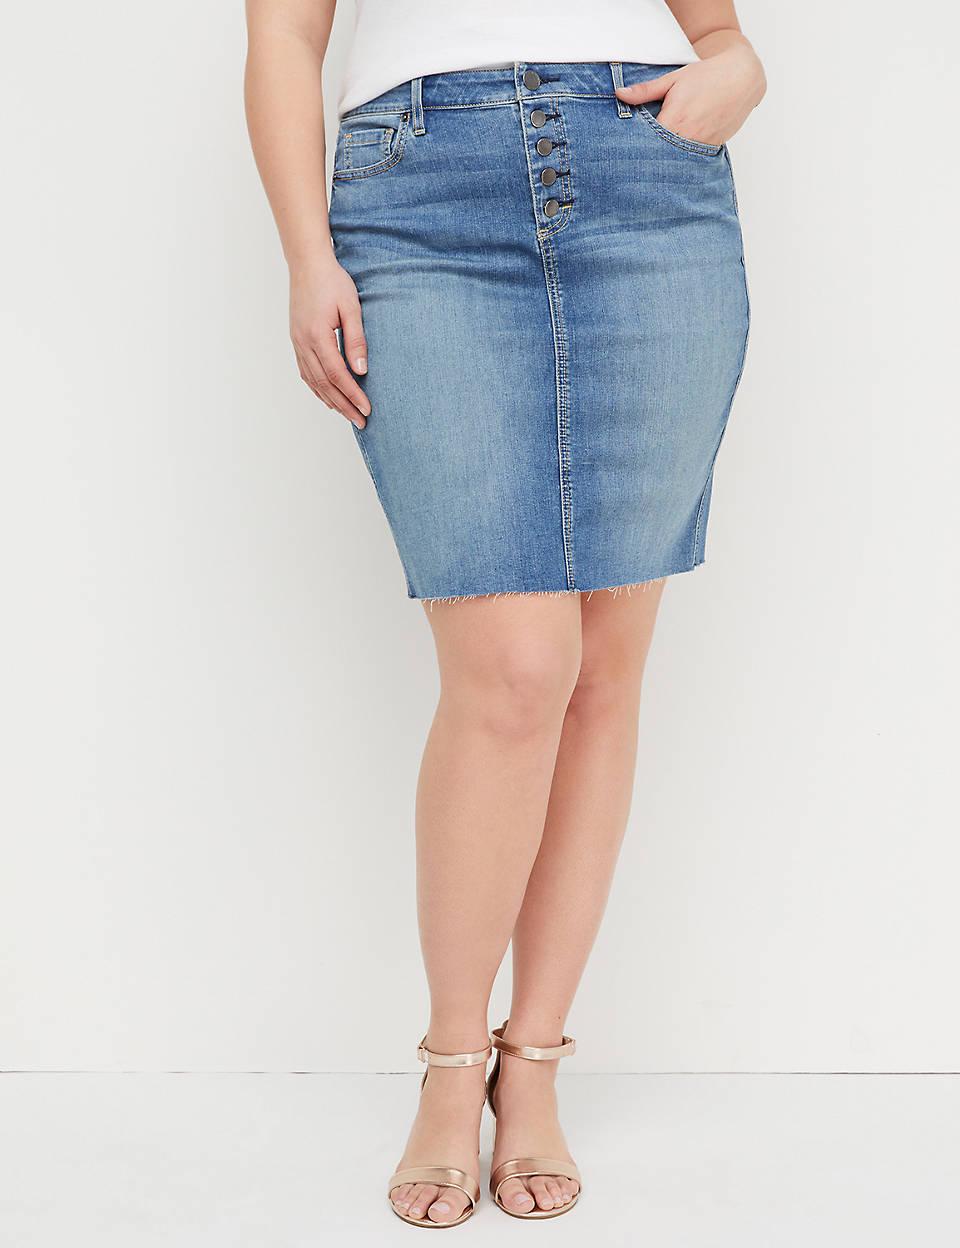 bf0eaca1bfccb Medium Wash Denim Skirt - Exposed Button Fly | Lane Bryant